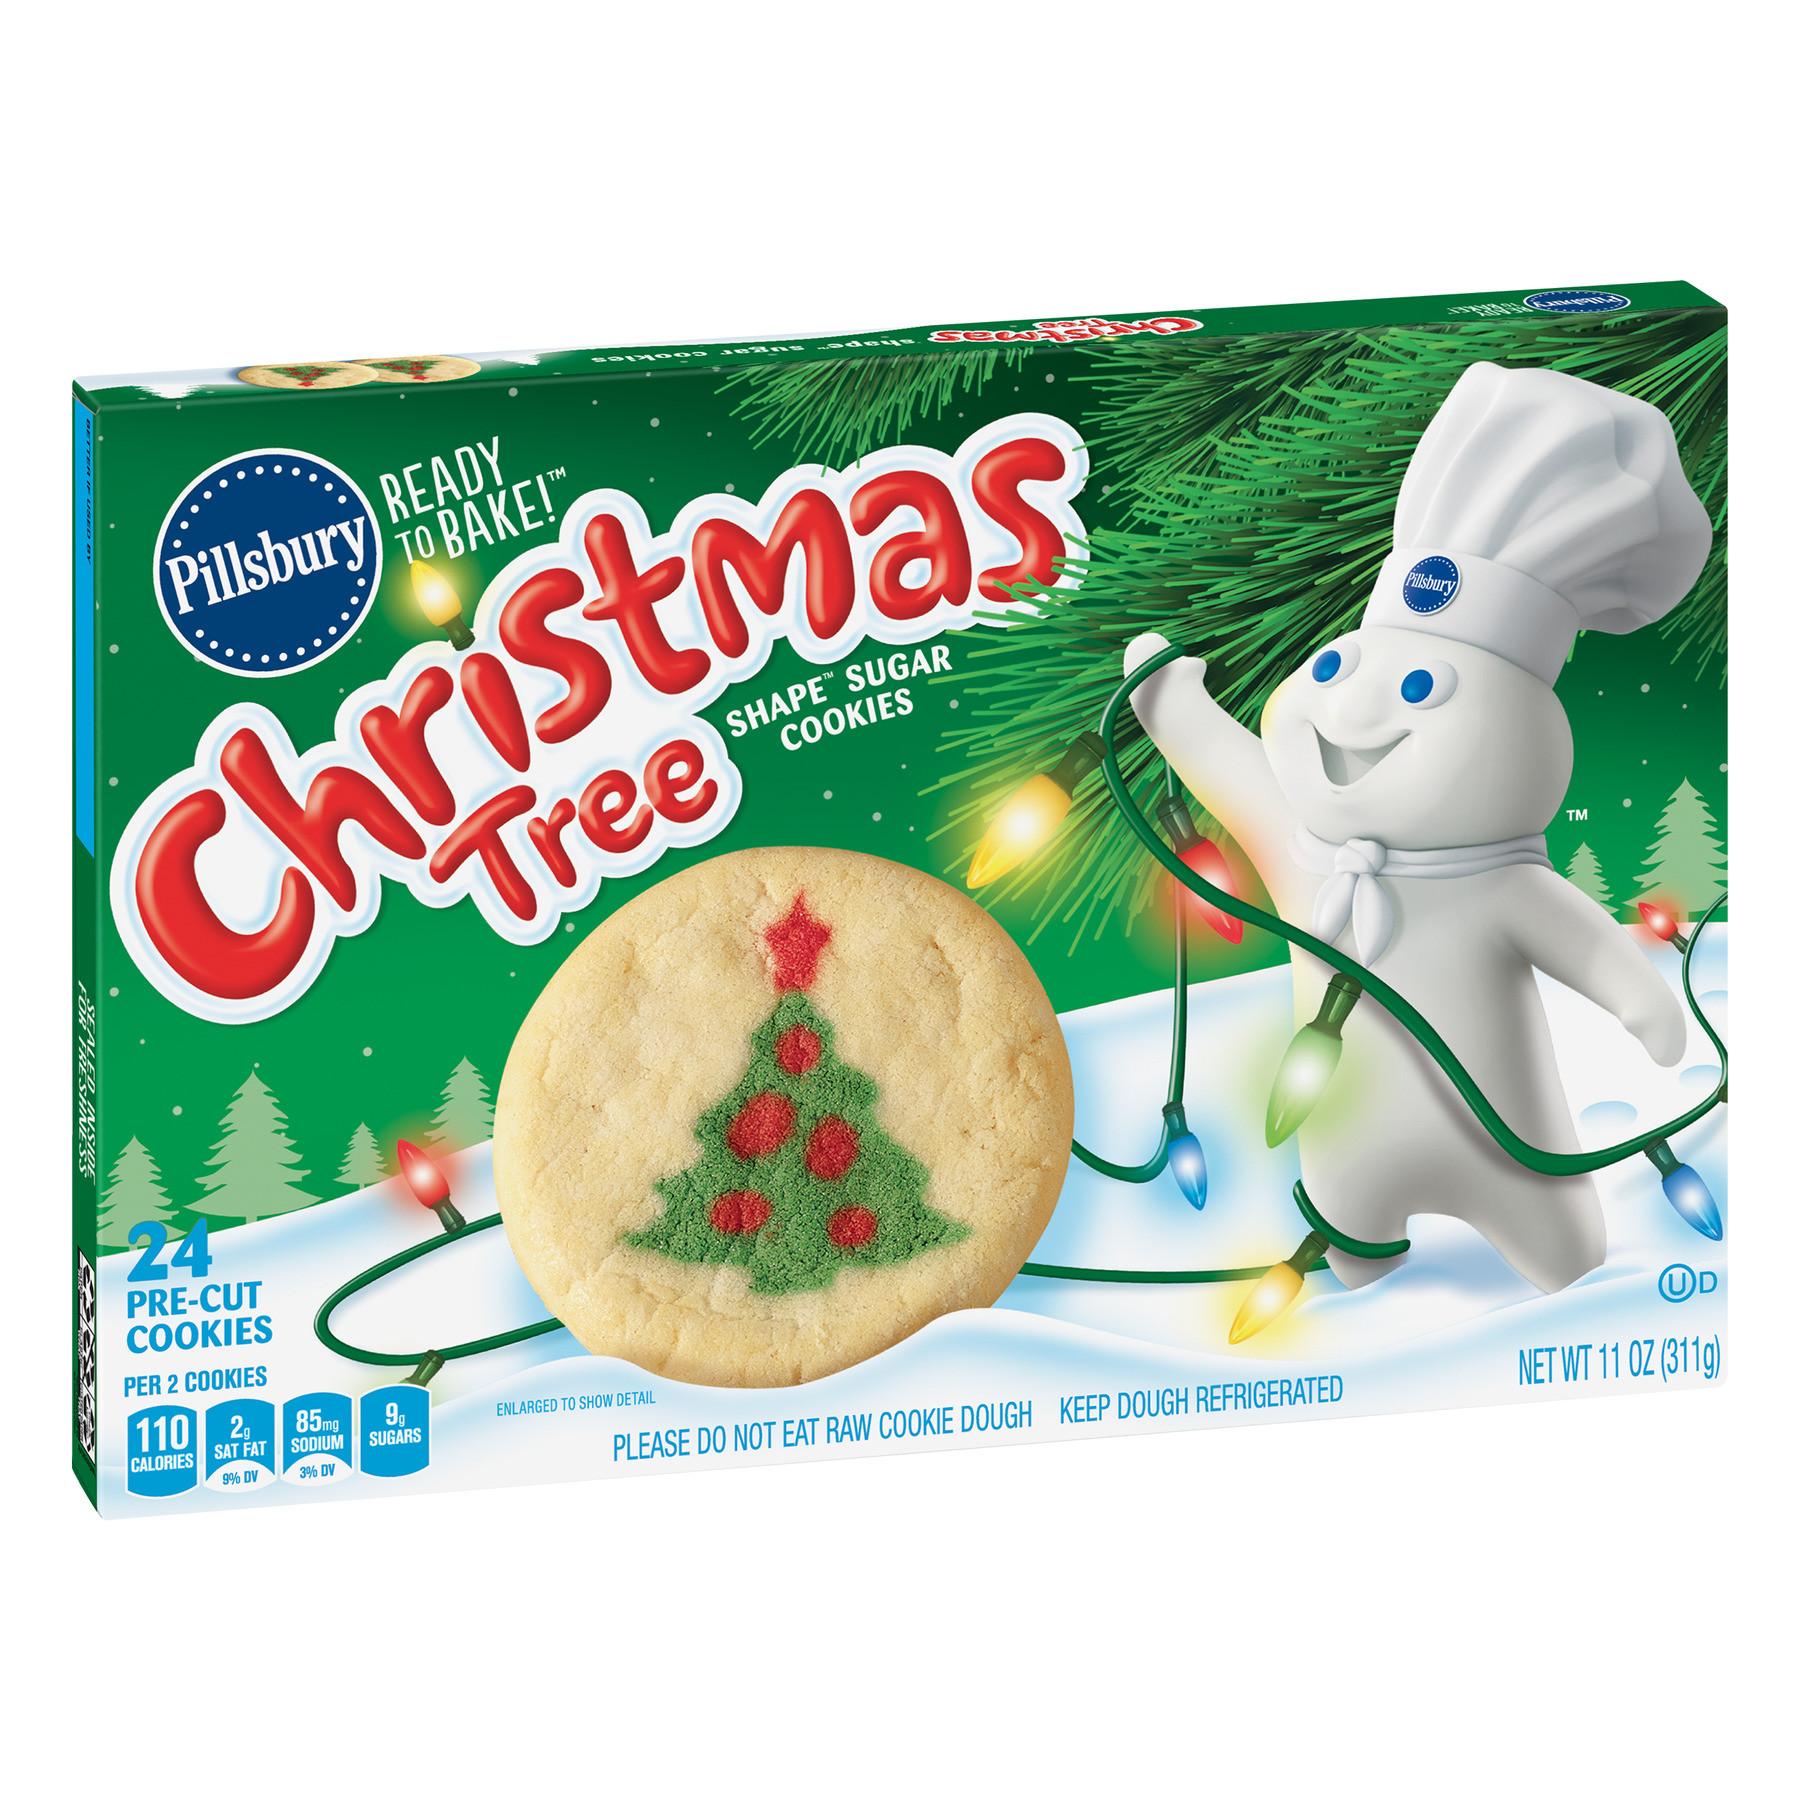 Christmas Cookies Walmart  Pillsbury Ready to Bake Christmas Tree Shape Sugar